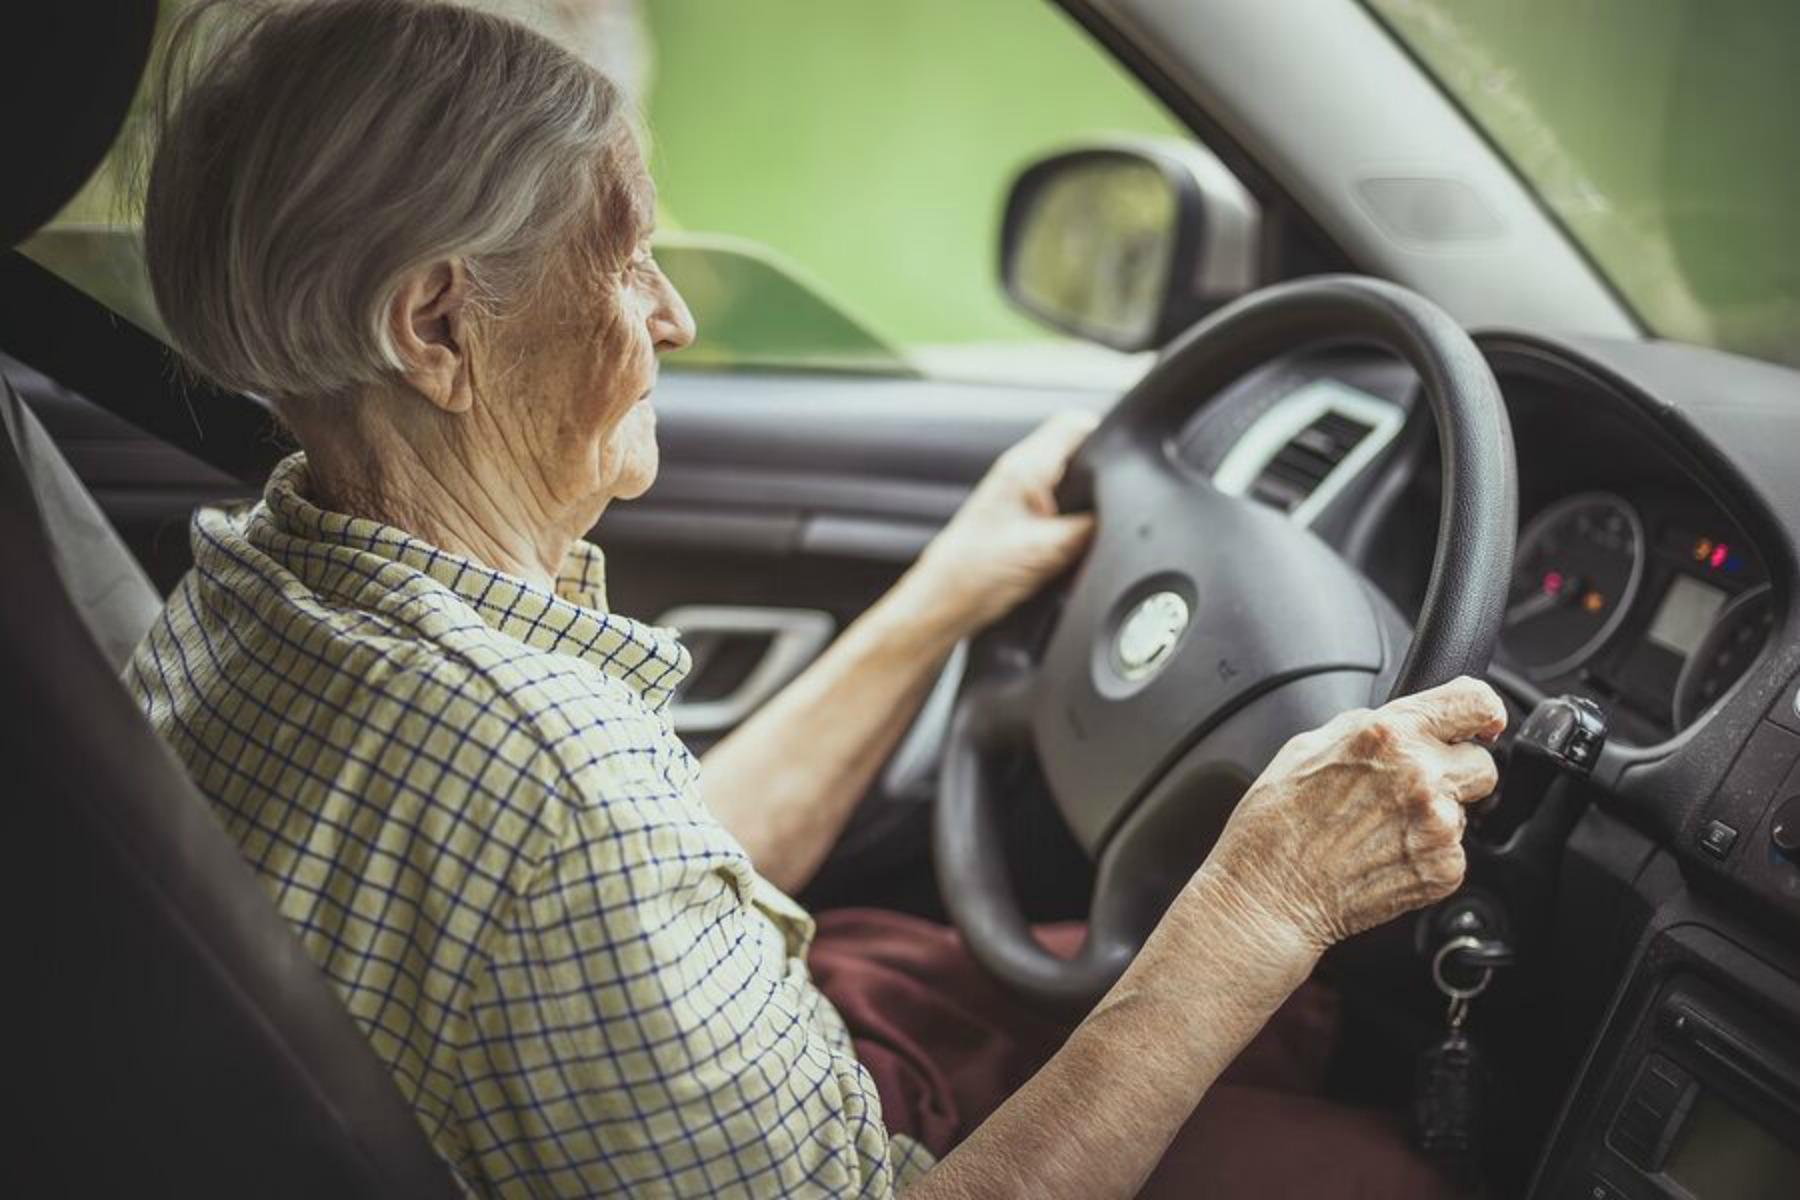 Senior Care Tips: Driving